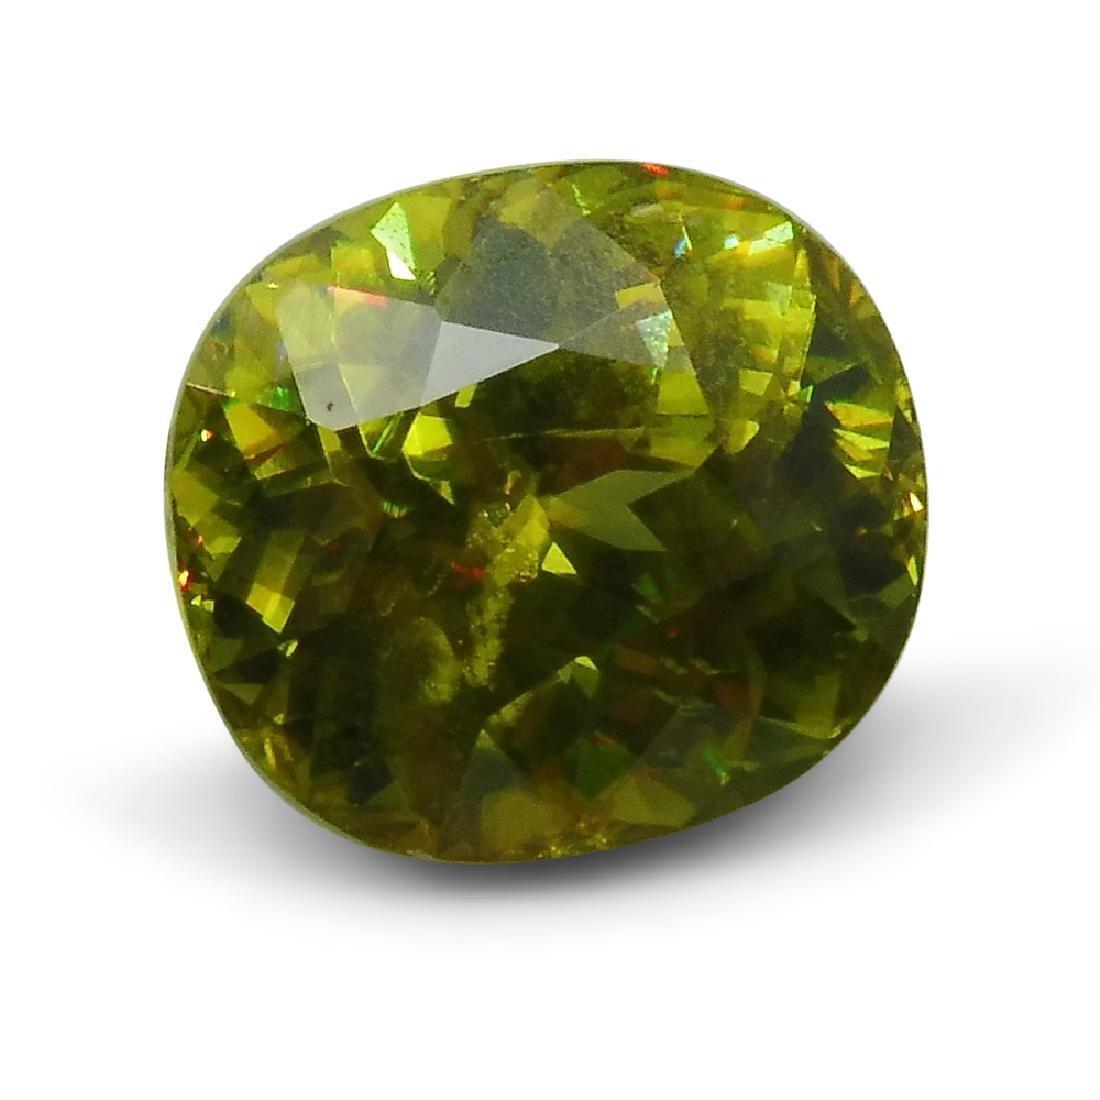 2.94 ct GIA Certified Sphene (Titanite)